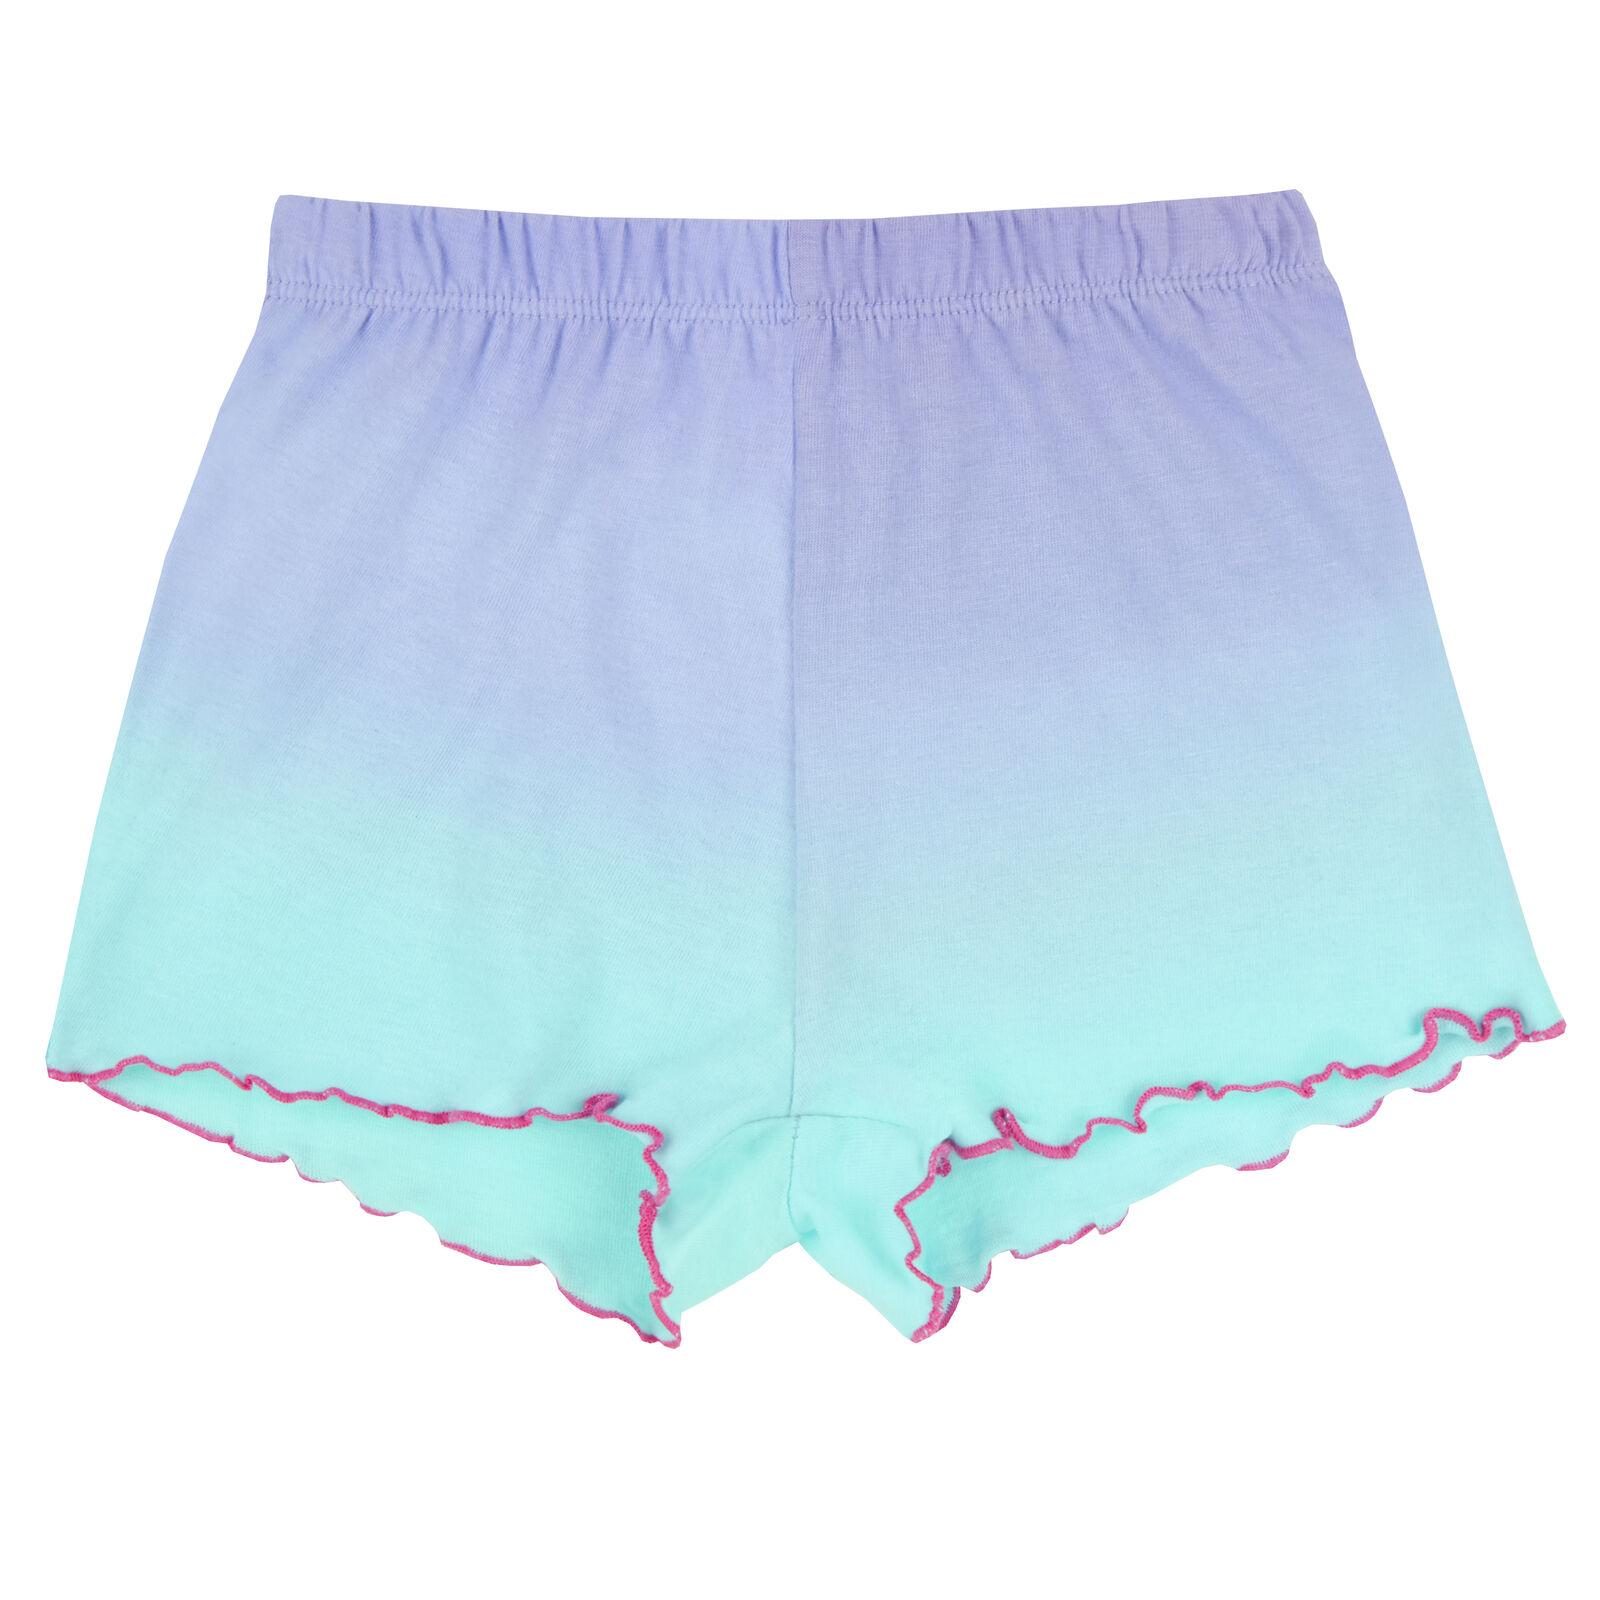 Filles Enfants Licorne Pyjama Set Summer Imprimé Sleepwear Nightwear Costume